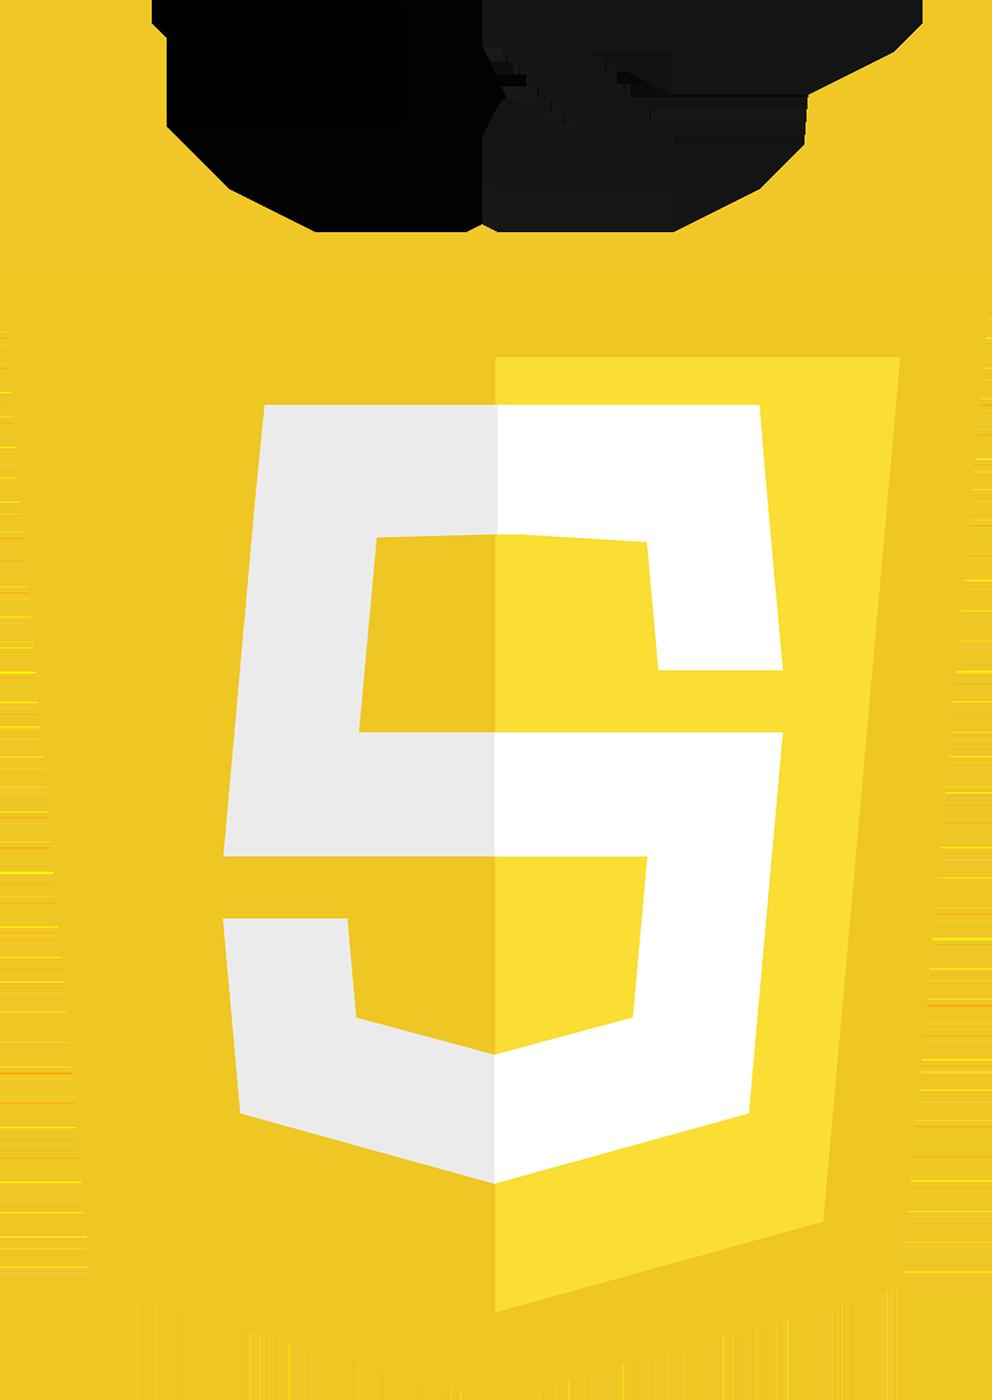 JS5 Certification